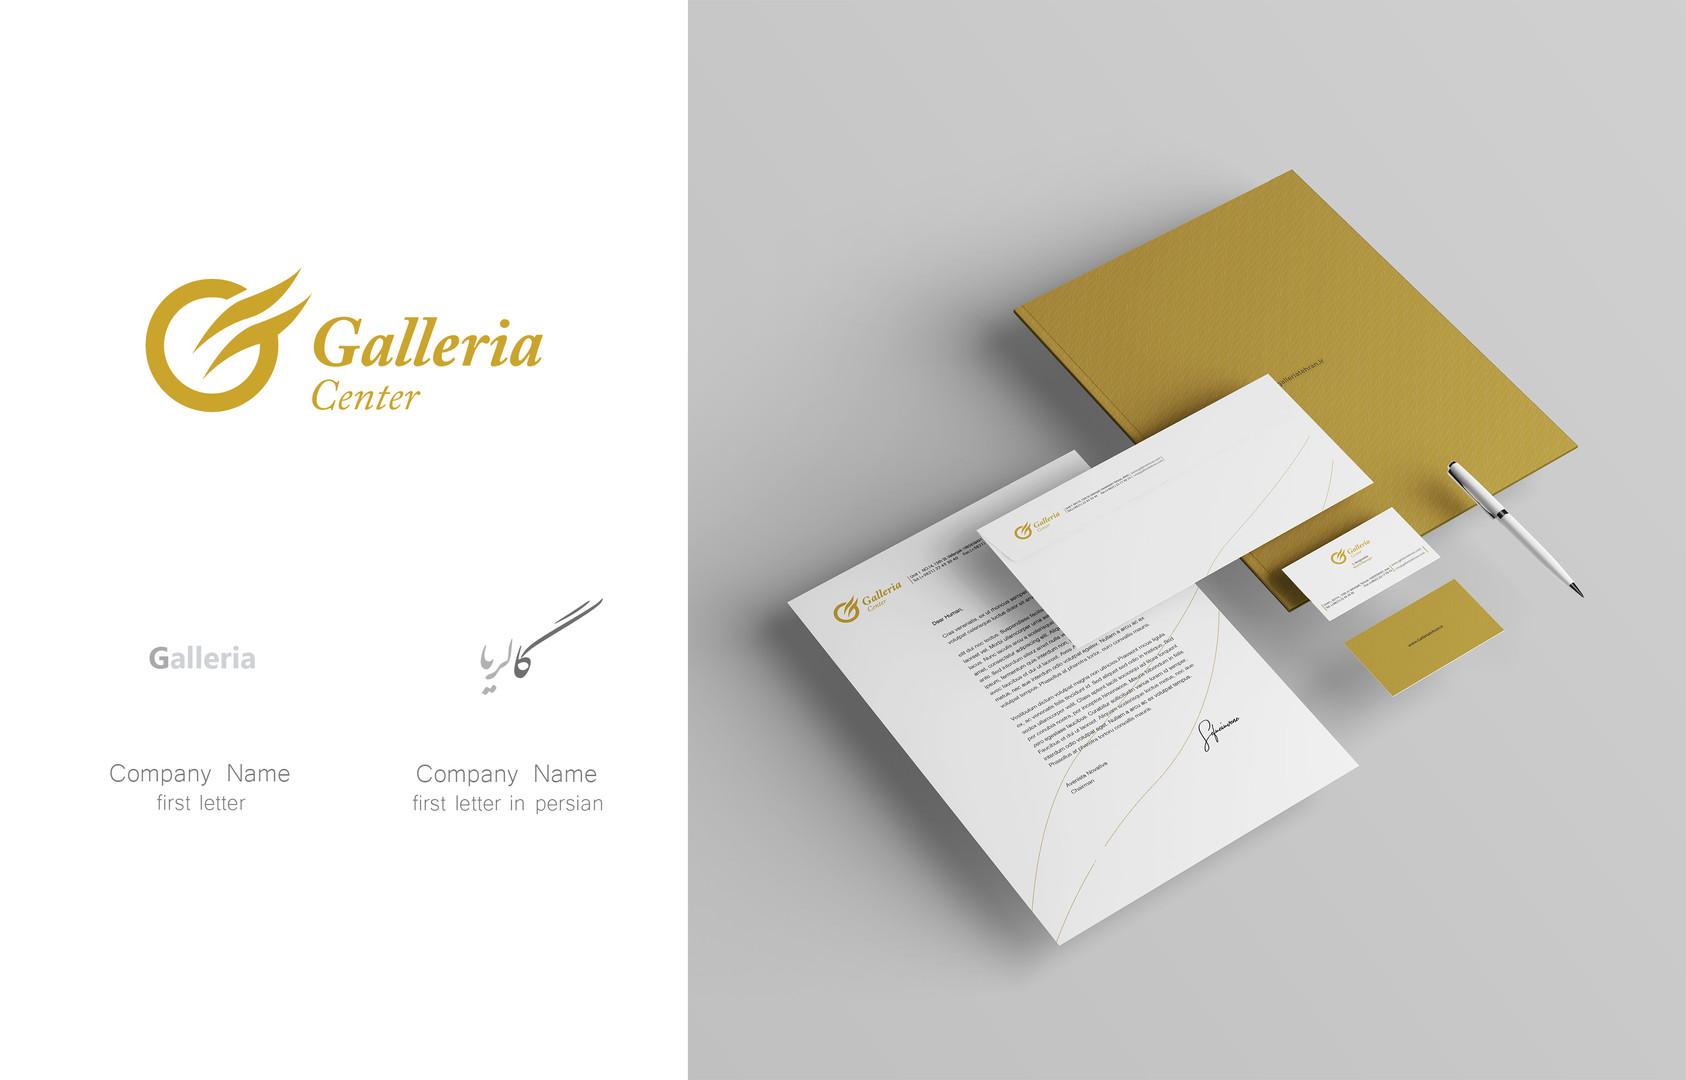 galleria2.jpg